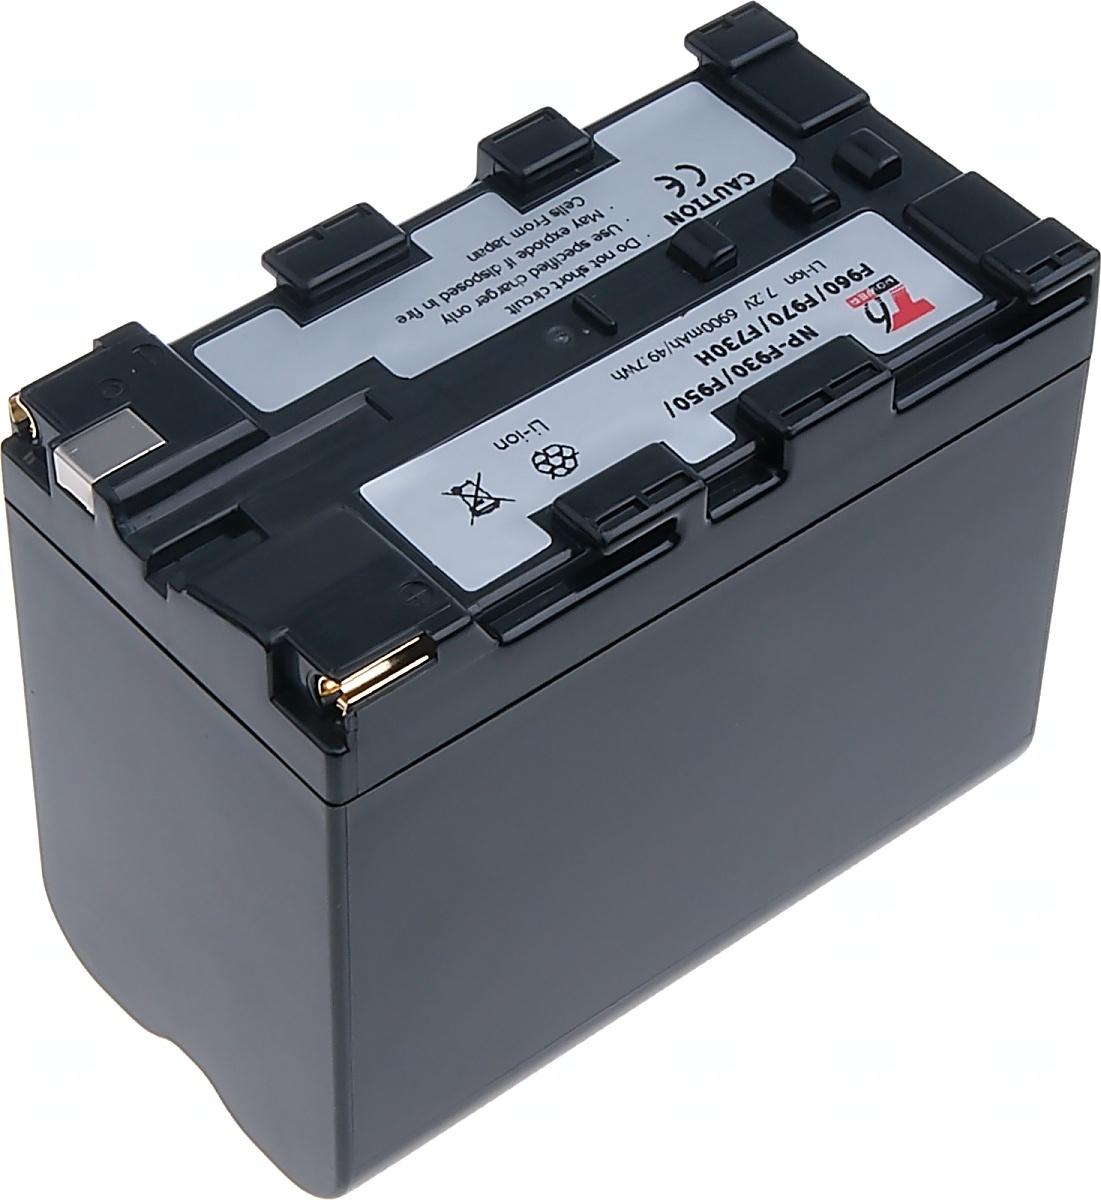 Baterie T6 power Sony NP-F930, NP-F950, NP-F960, NP-F730H, NP-F970, 6900mAh, šedá